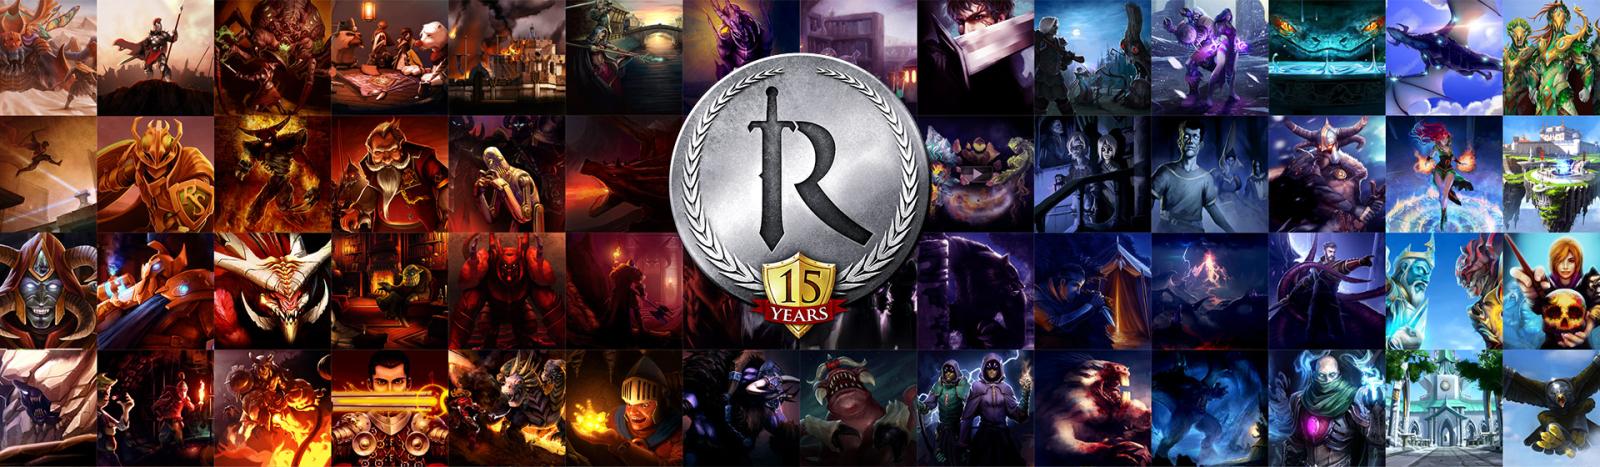 RS-15_Rotator_15th-Bday_EN[1]